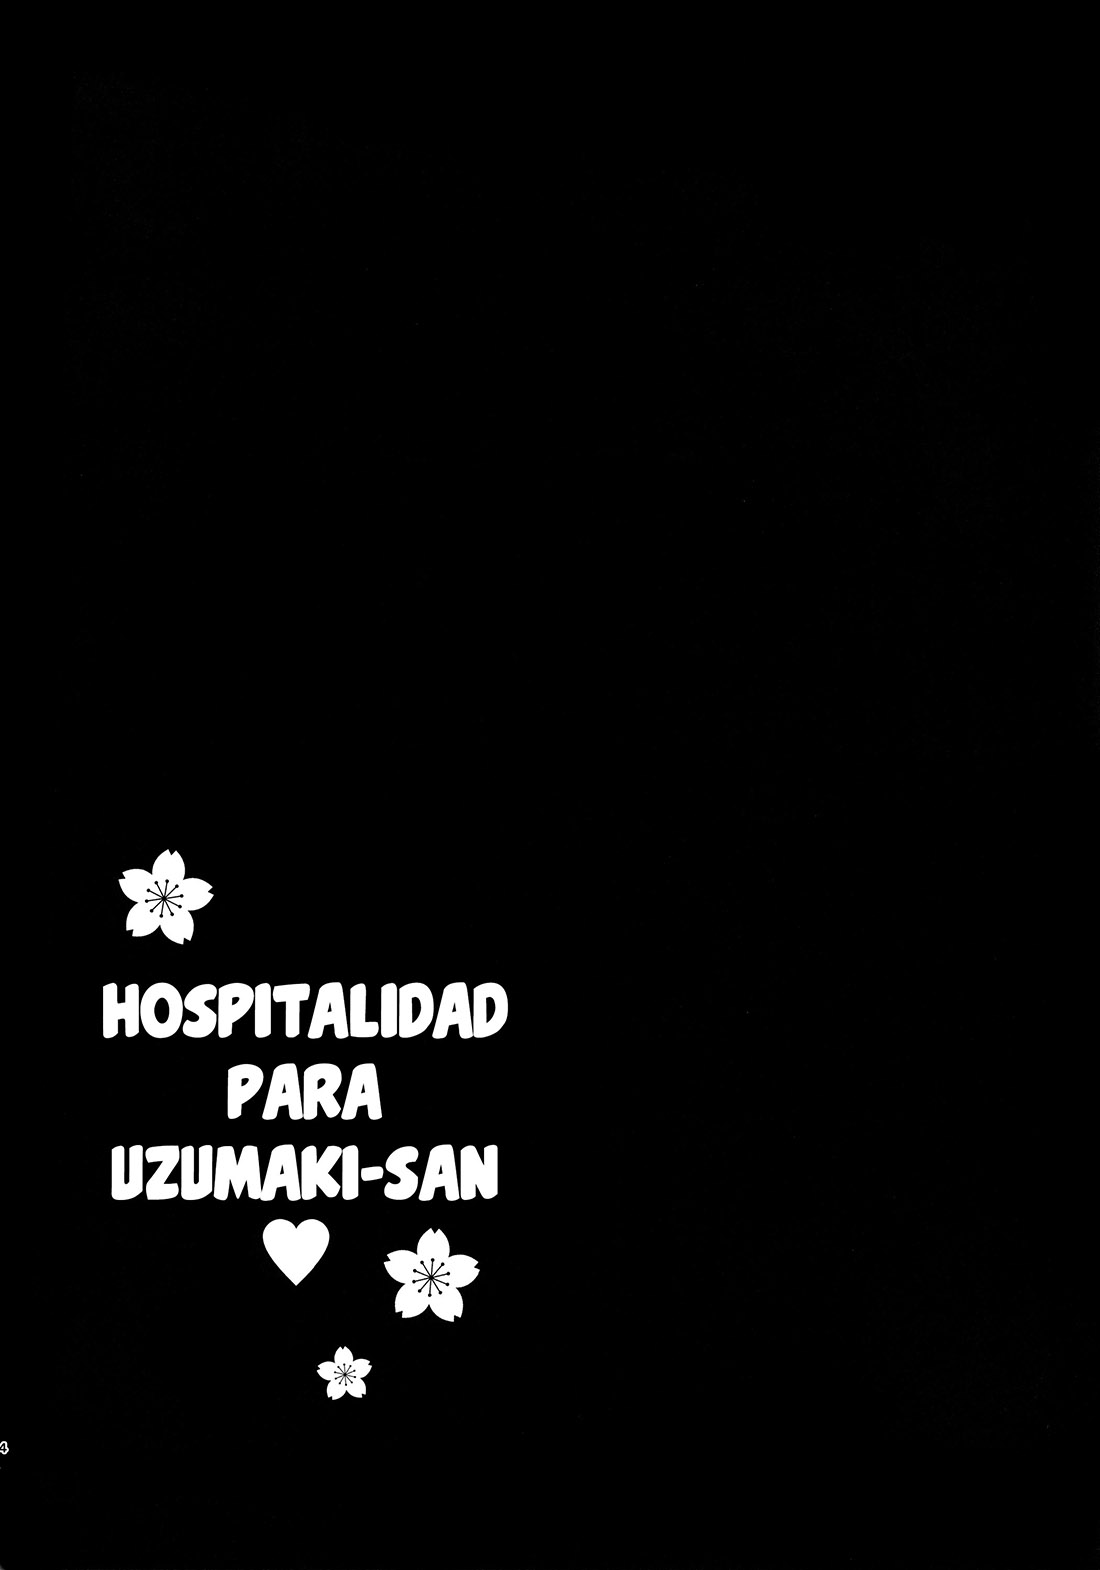 Hospitalidad para UZAMAKI